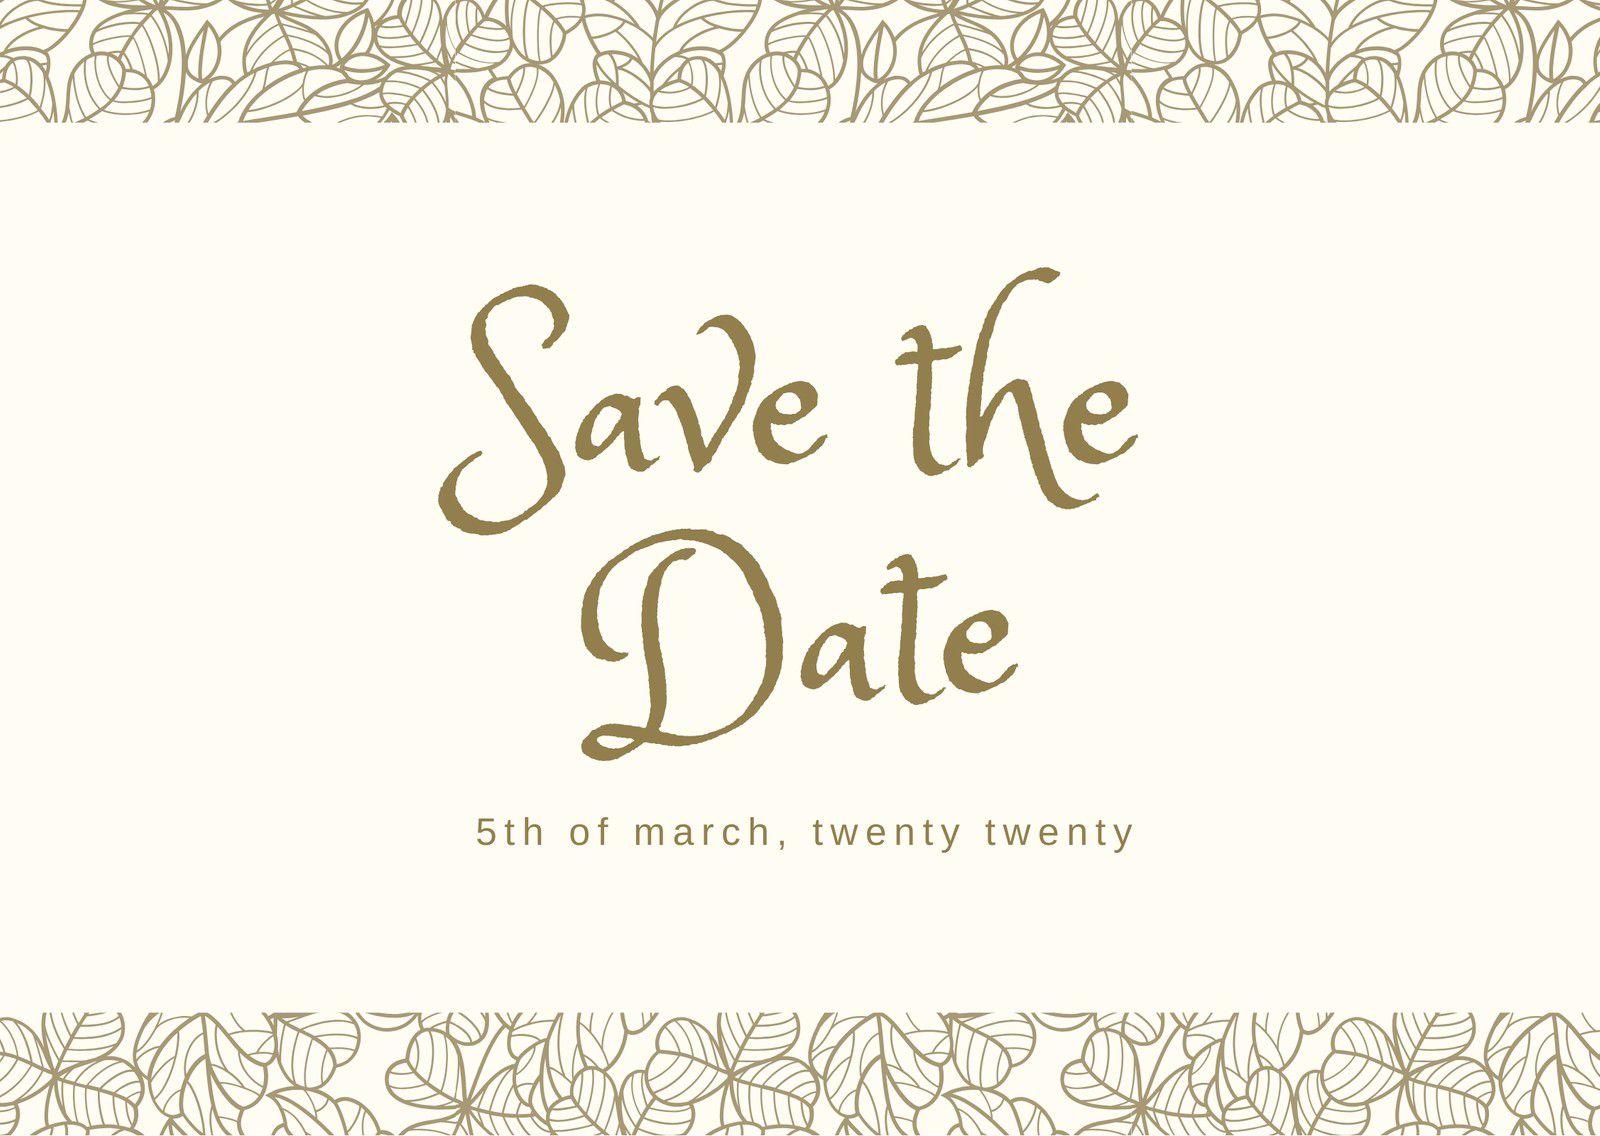 002 Striking Save The Date Postcard Template High Definition  Diy Free BirthdayFull